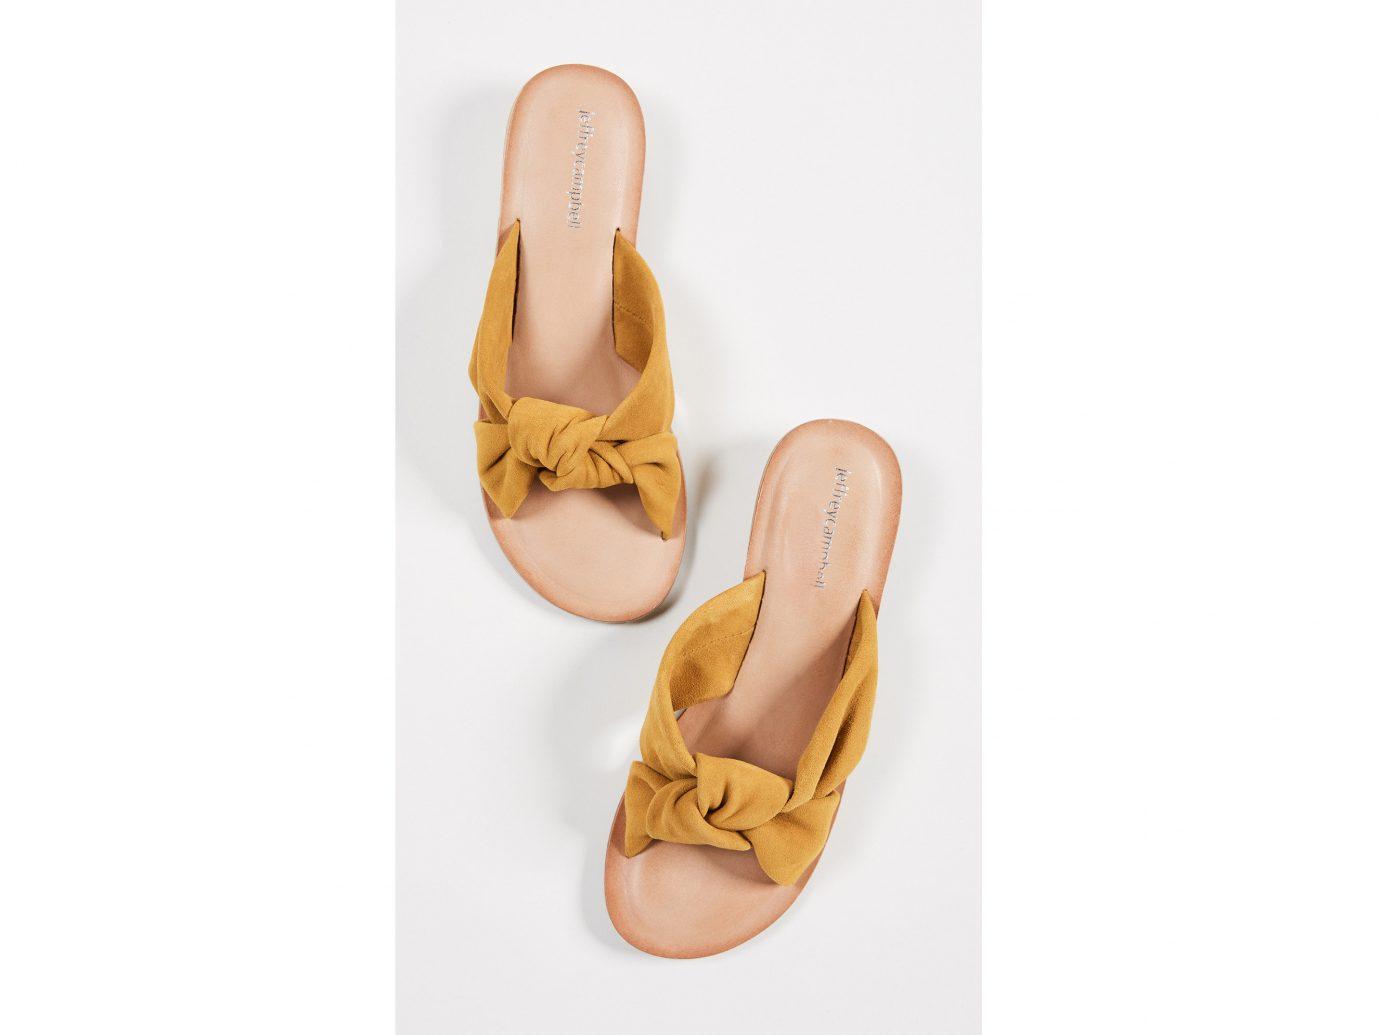 City Palm Springs Style + Design Travel Shop footwear yellow shoe sandal ballet flat outdoor shoe peach product design flip flops beige different